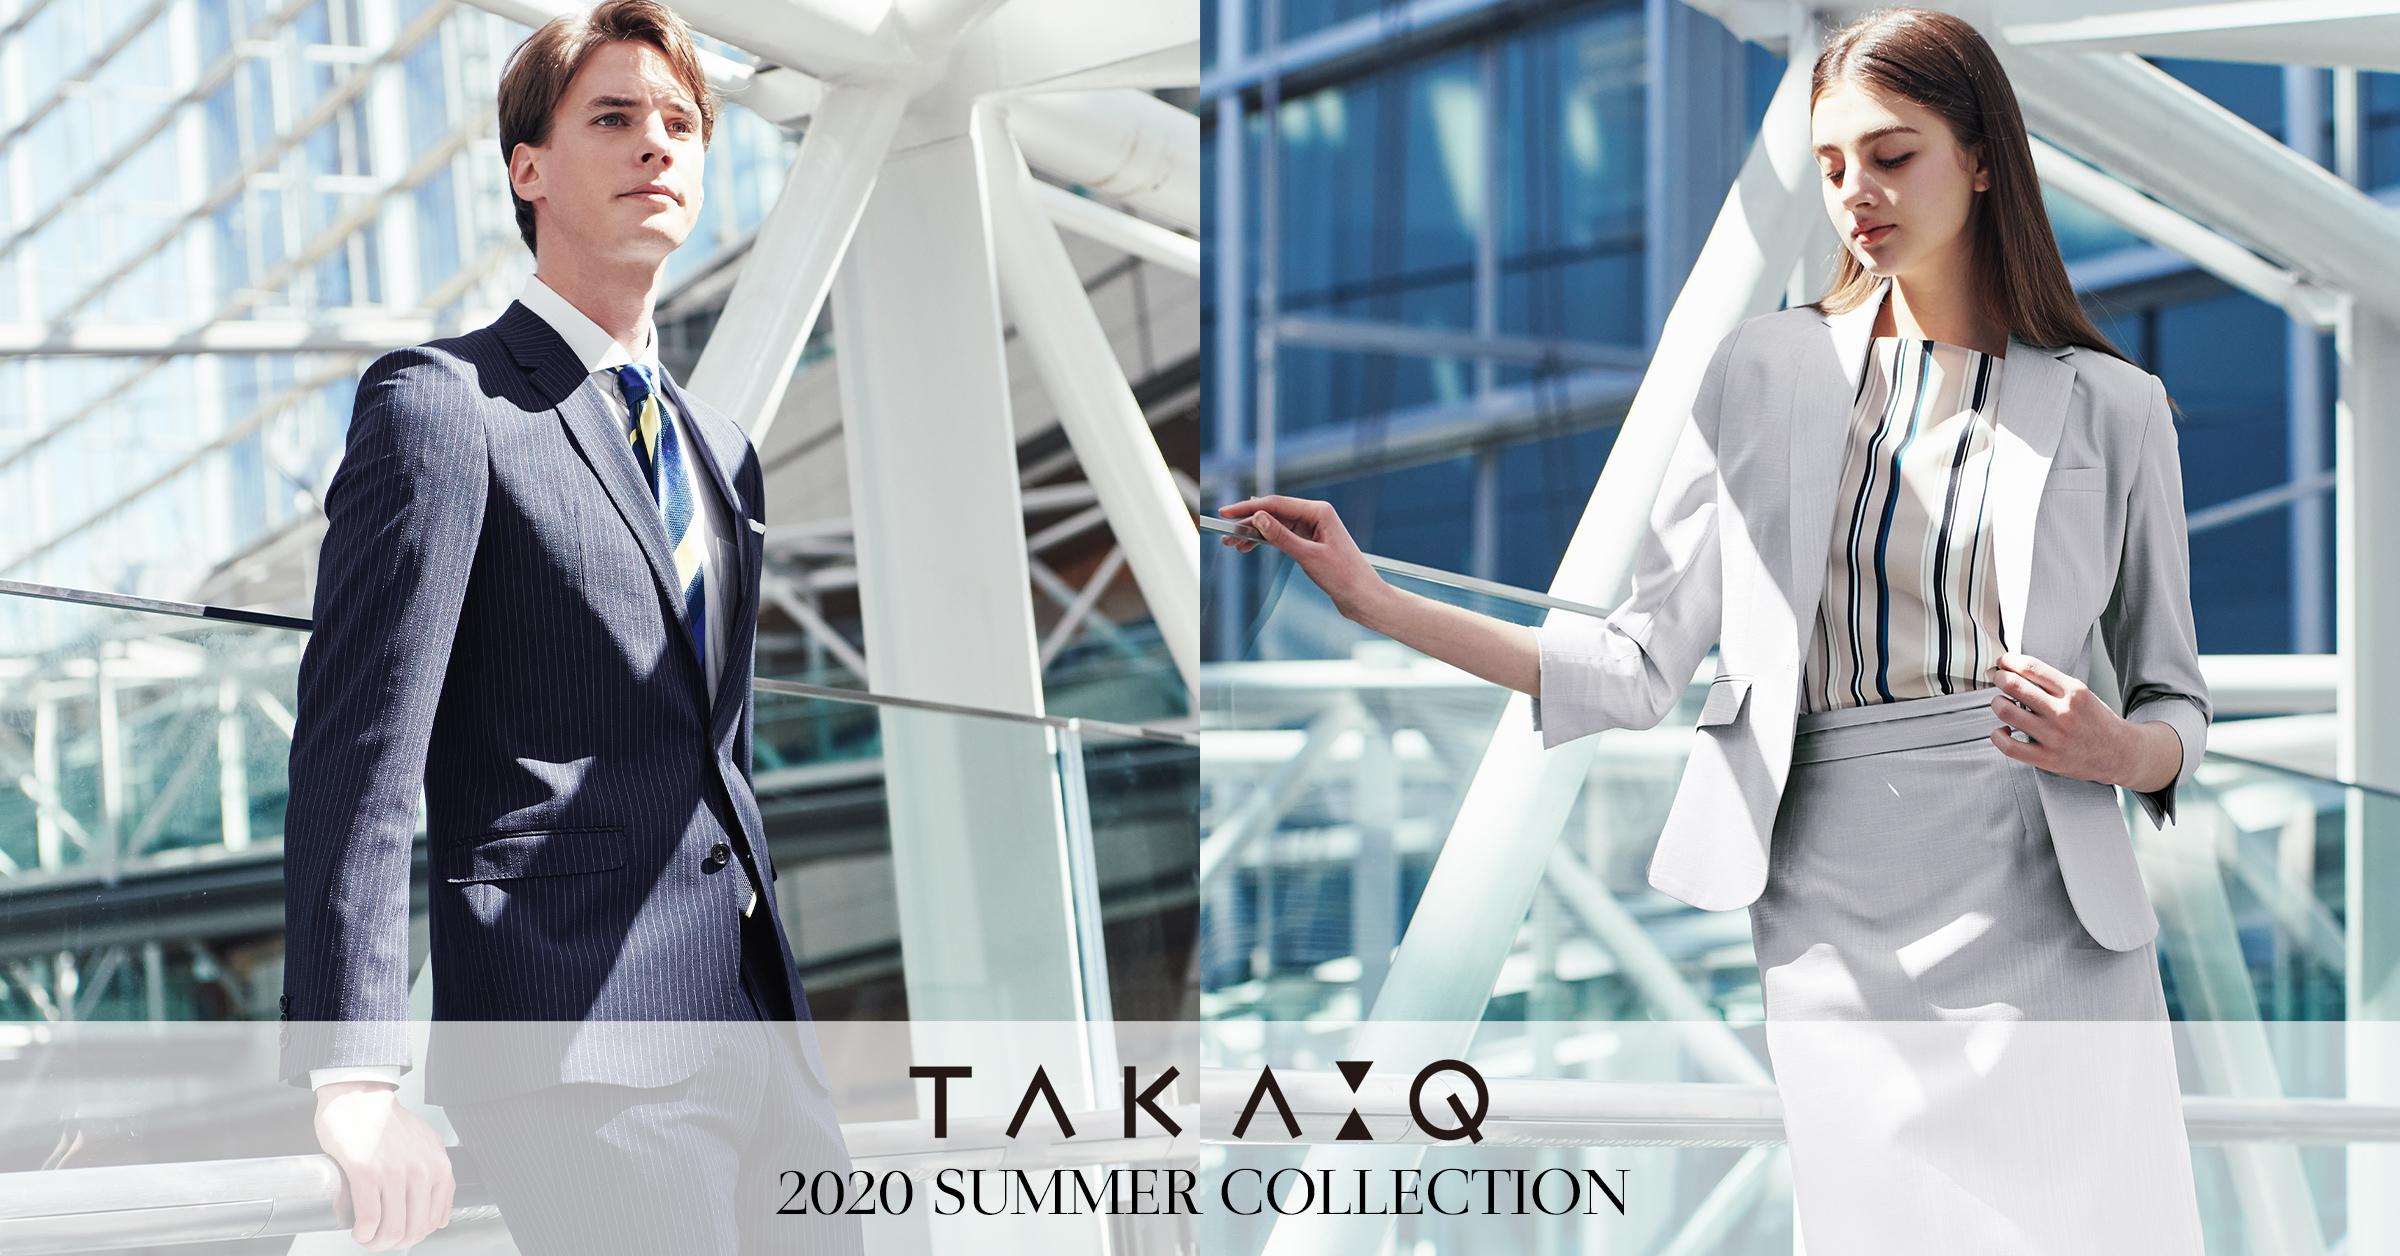 TAKA-Q 2020 SUMMER COLLECTION